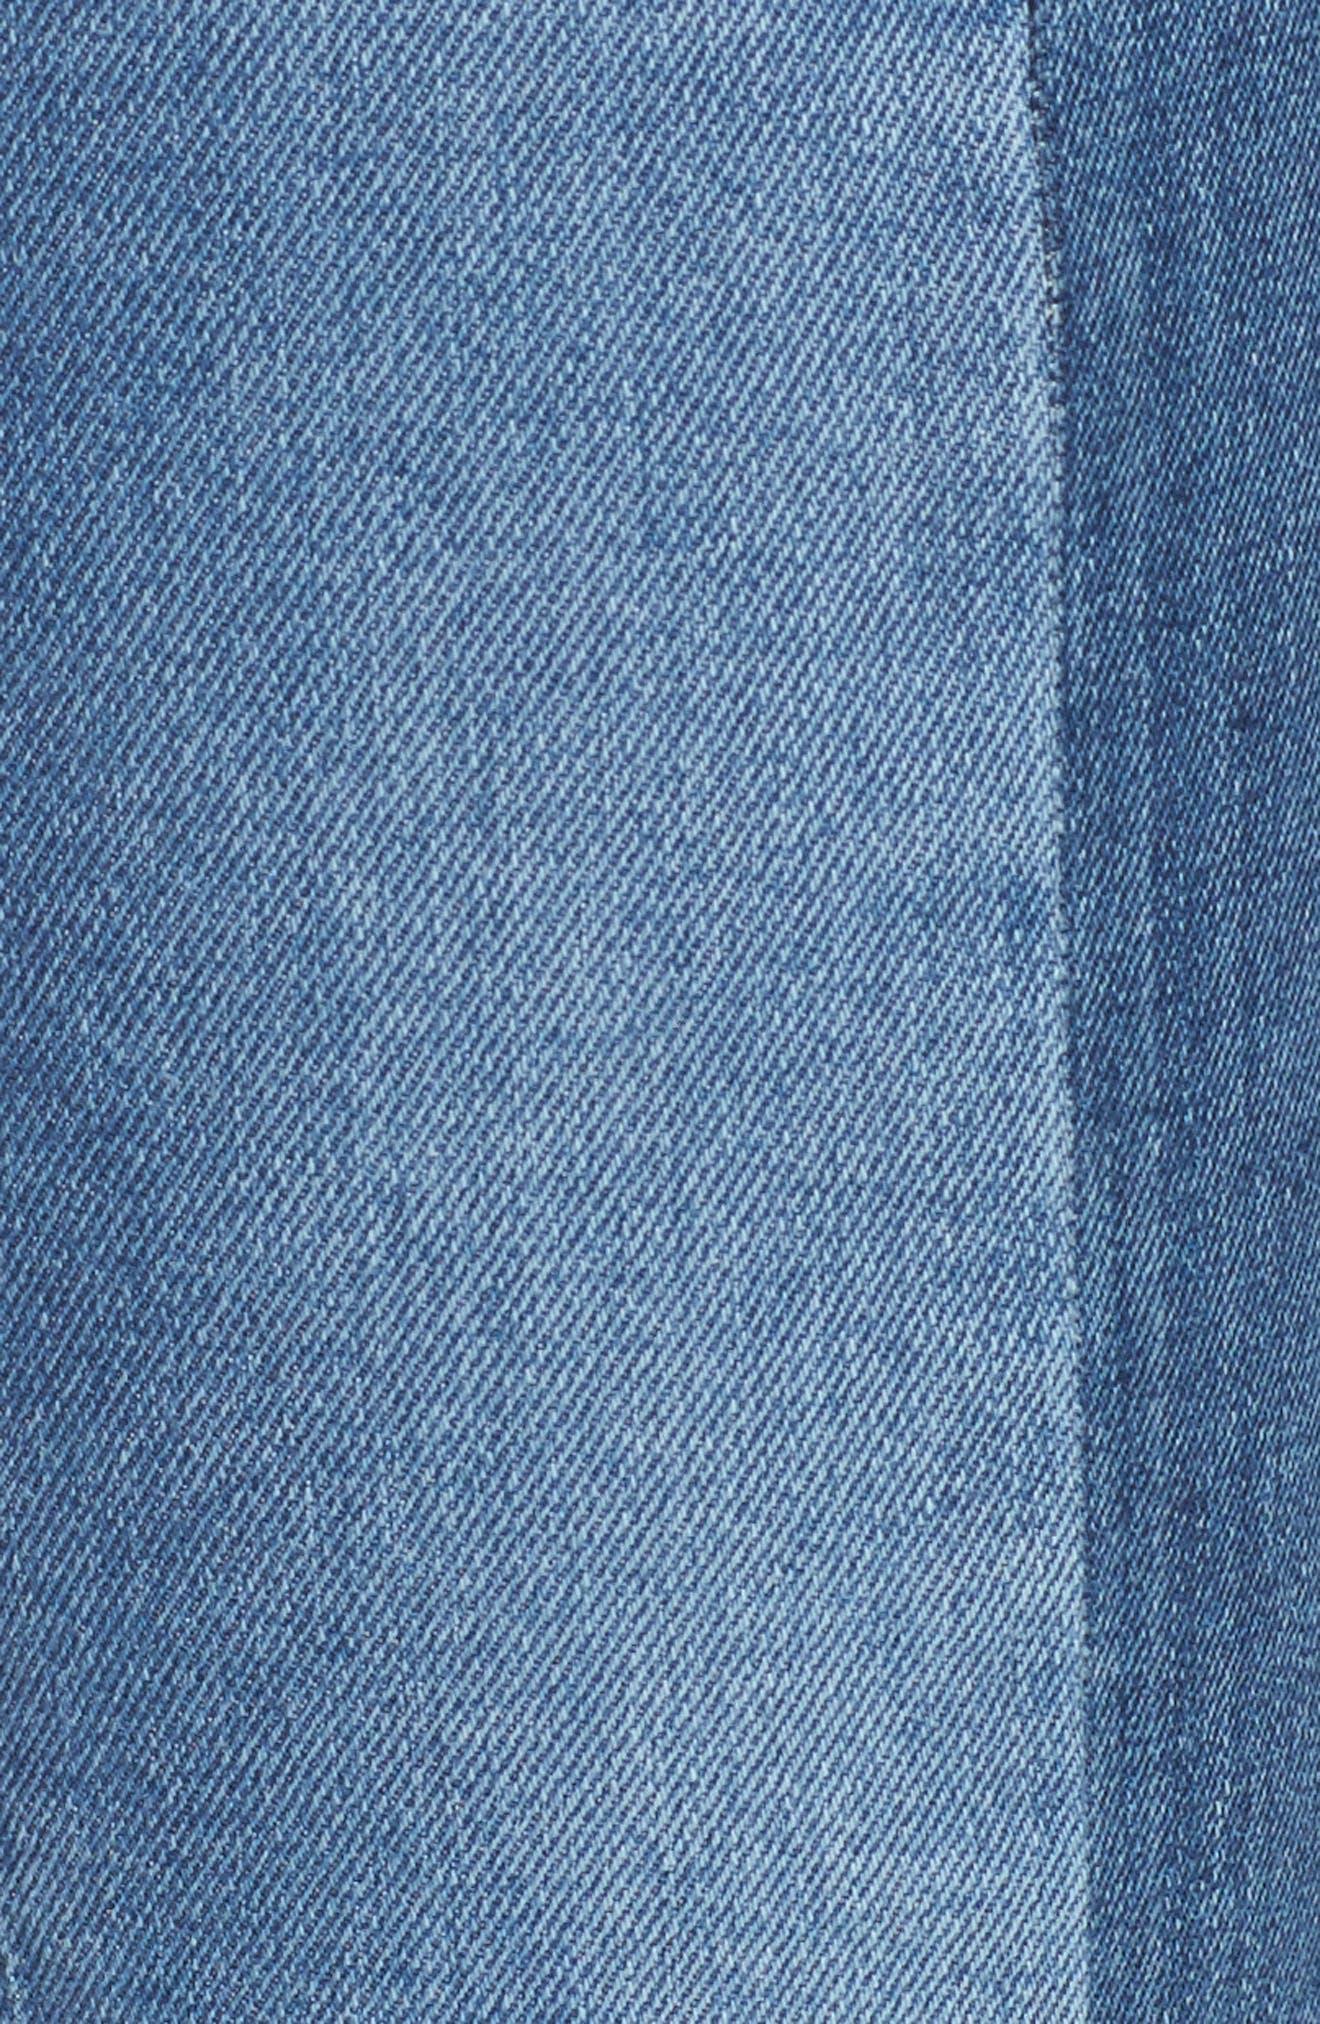 Tess Blocked Super Skinny Jeans,                             Alternate thumbnail 5, color,